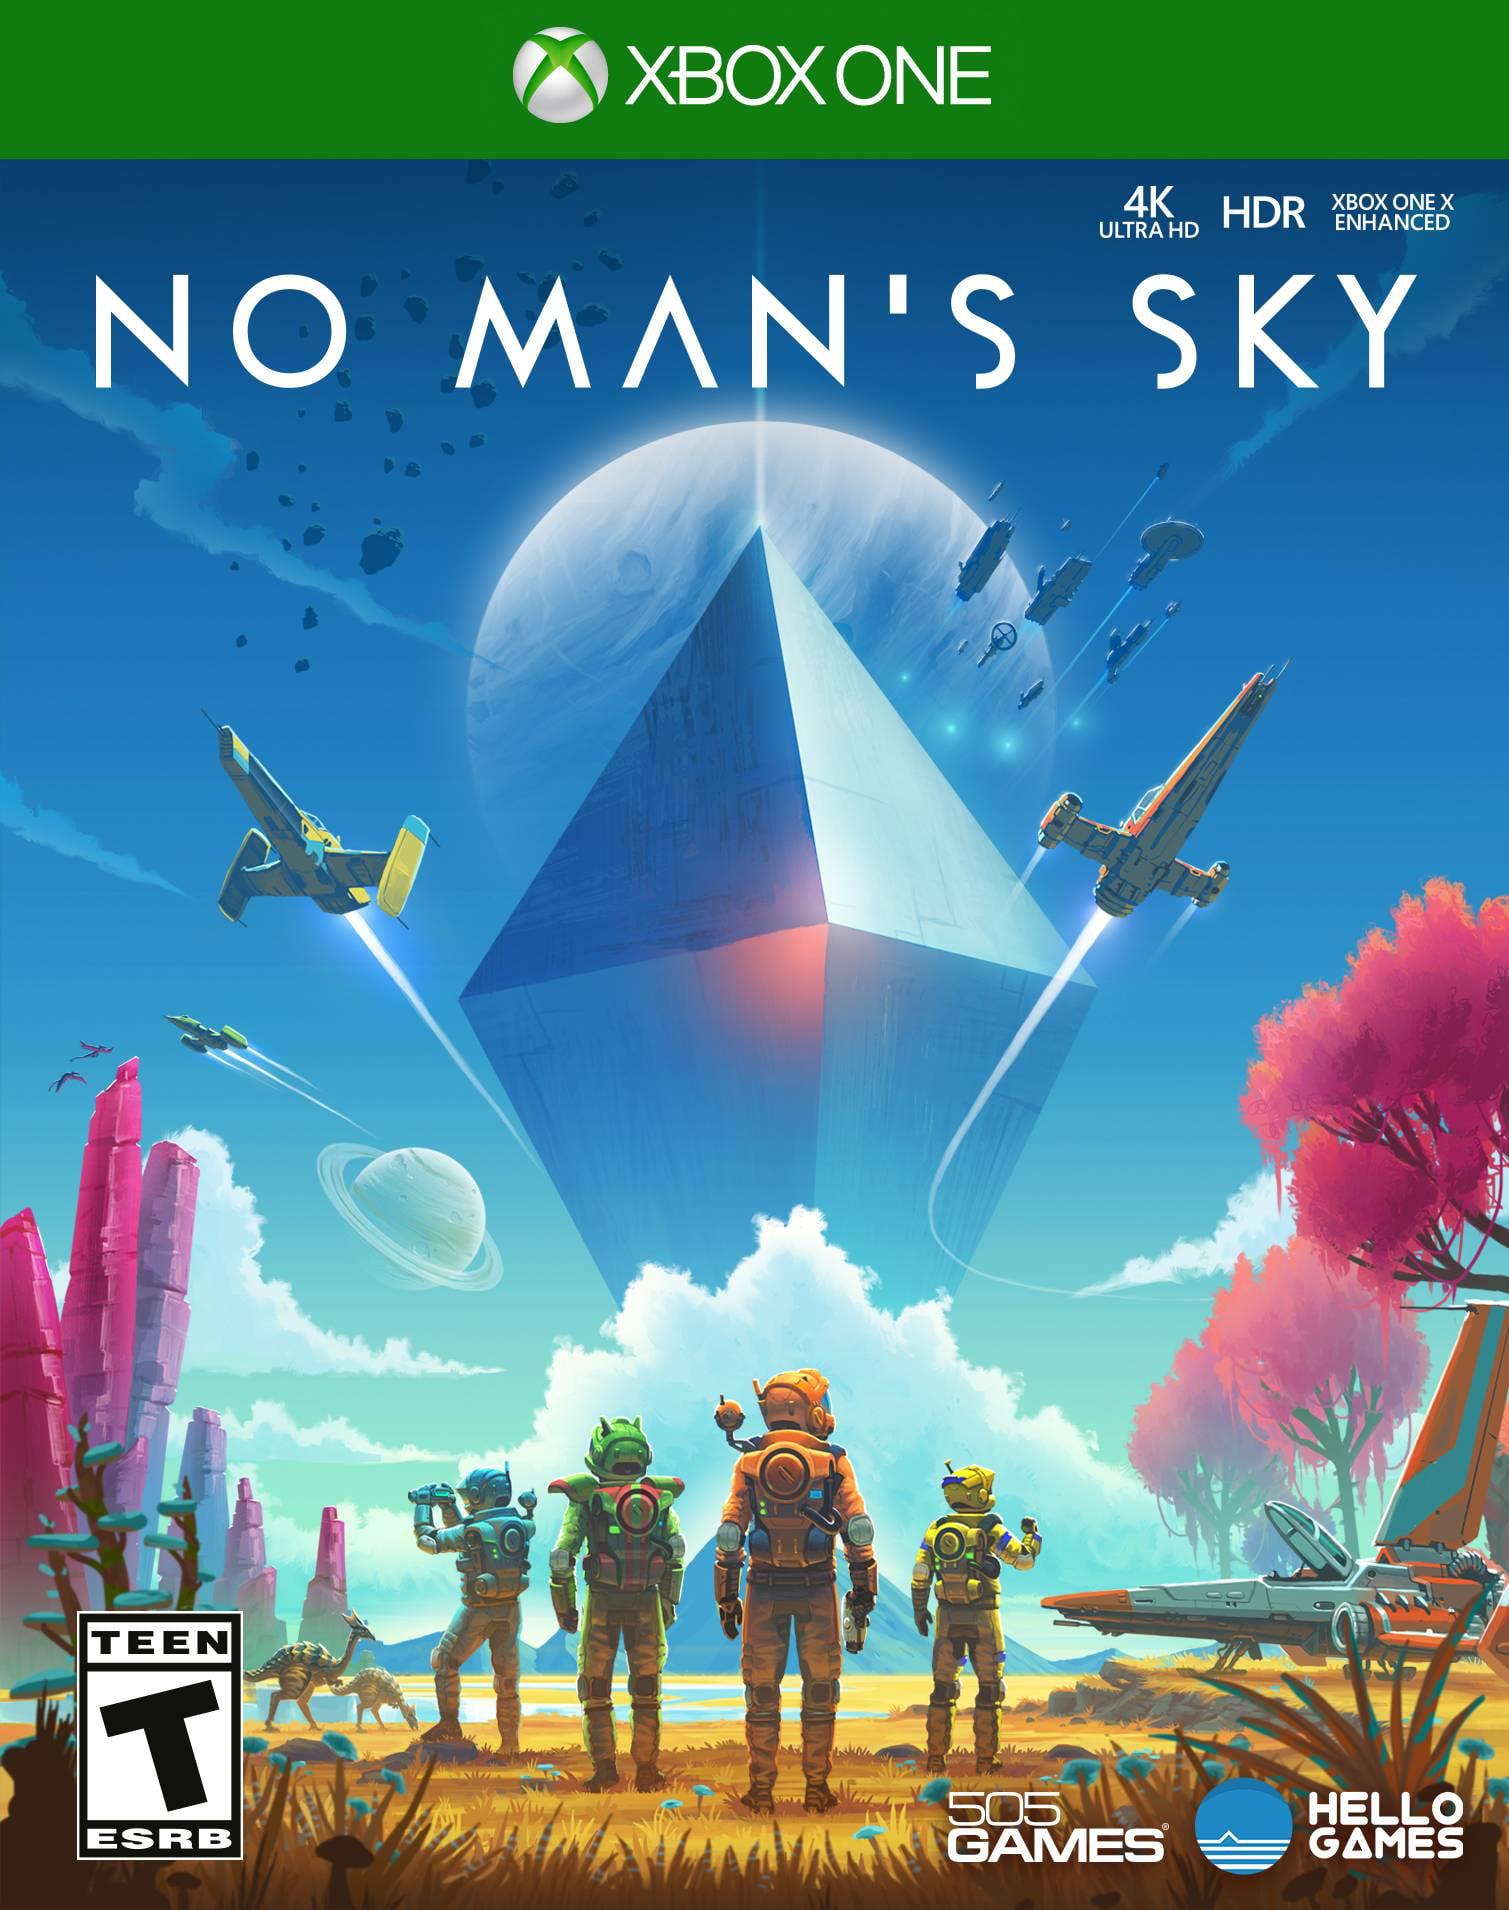 No Man's Sky, 505 Games, Xbox One, 812872018652